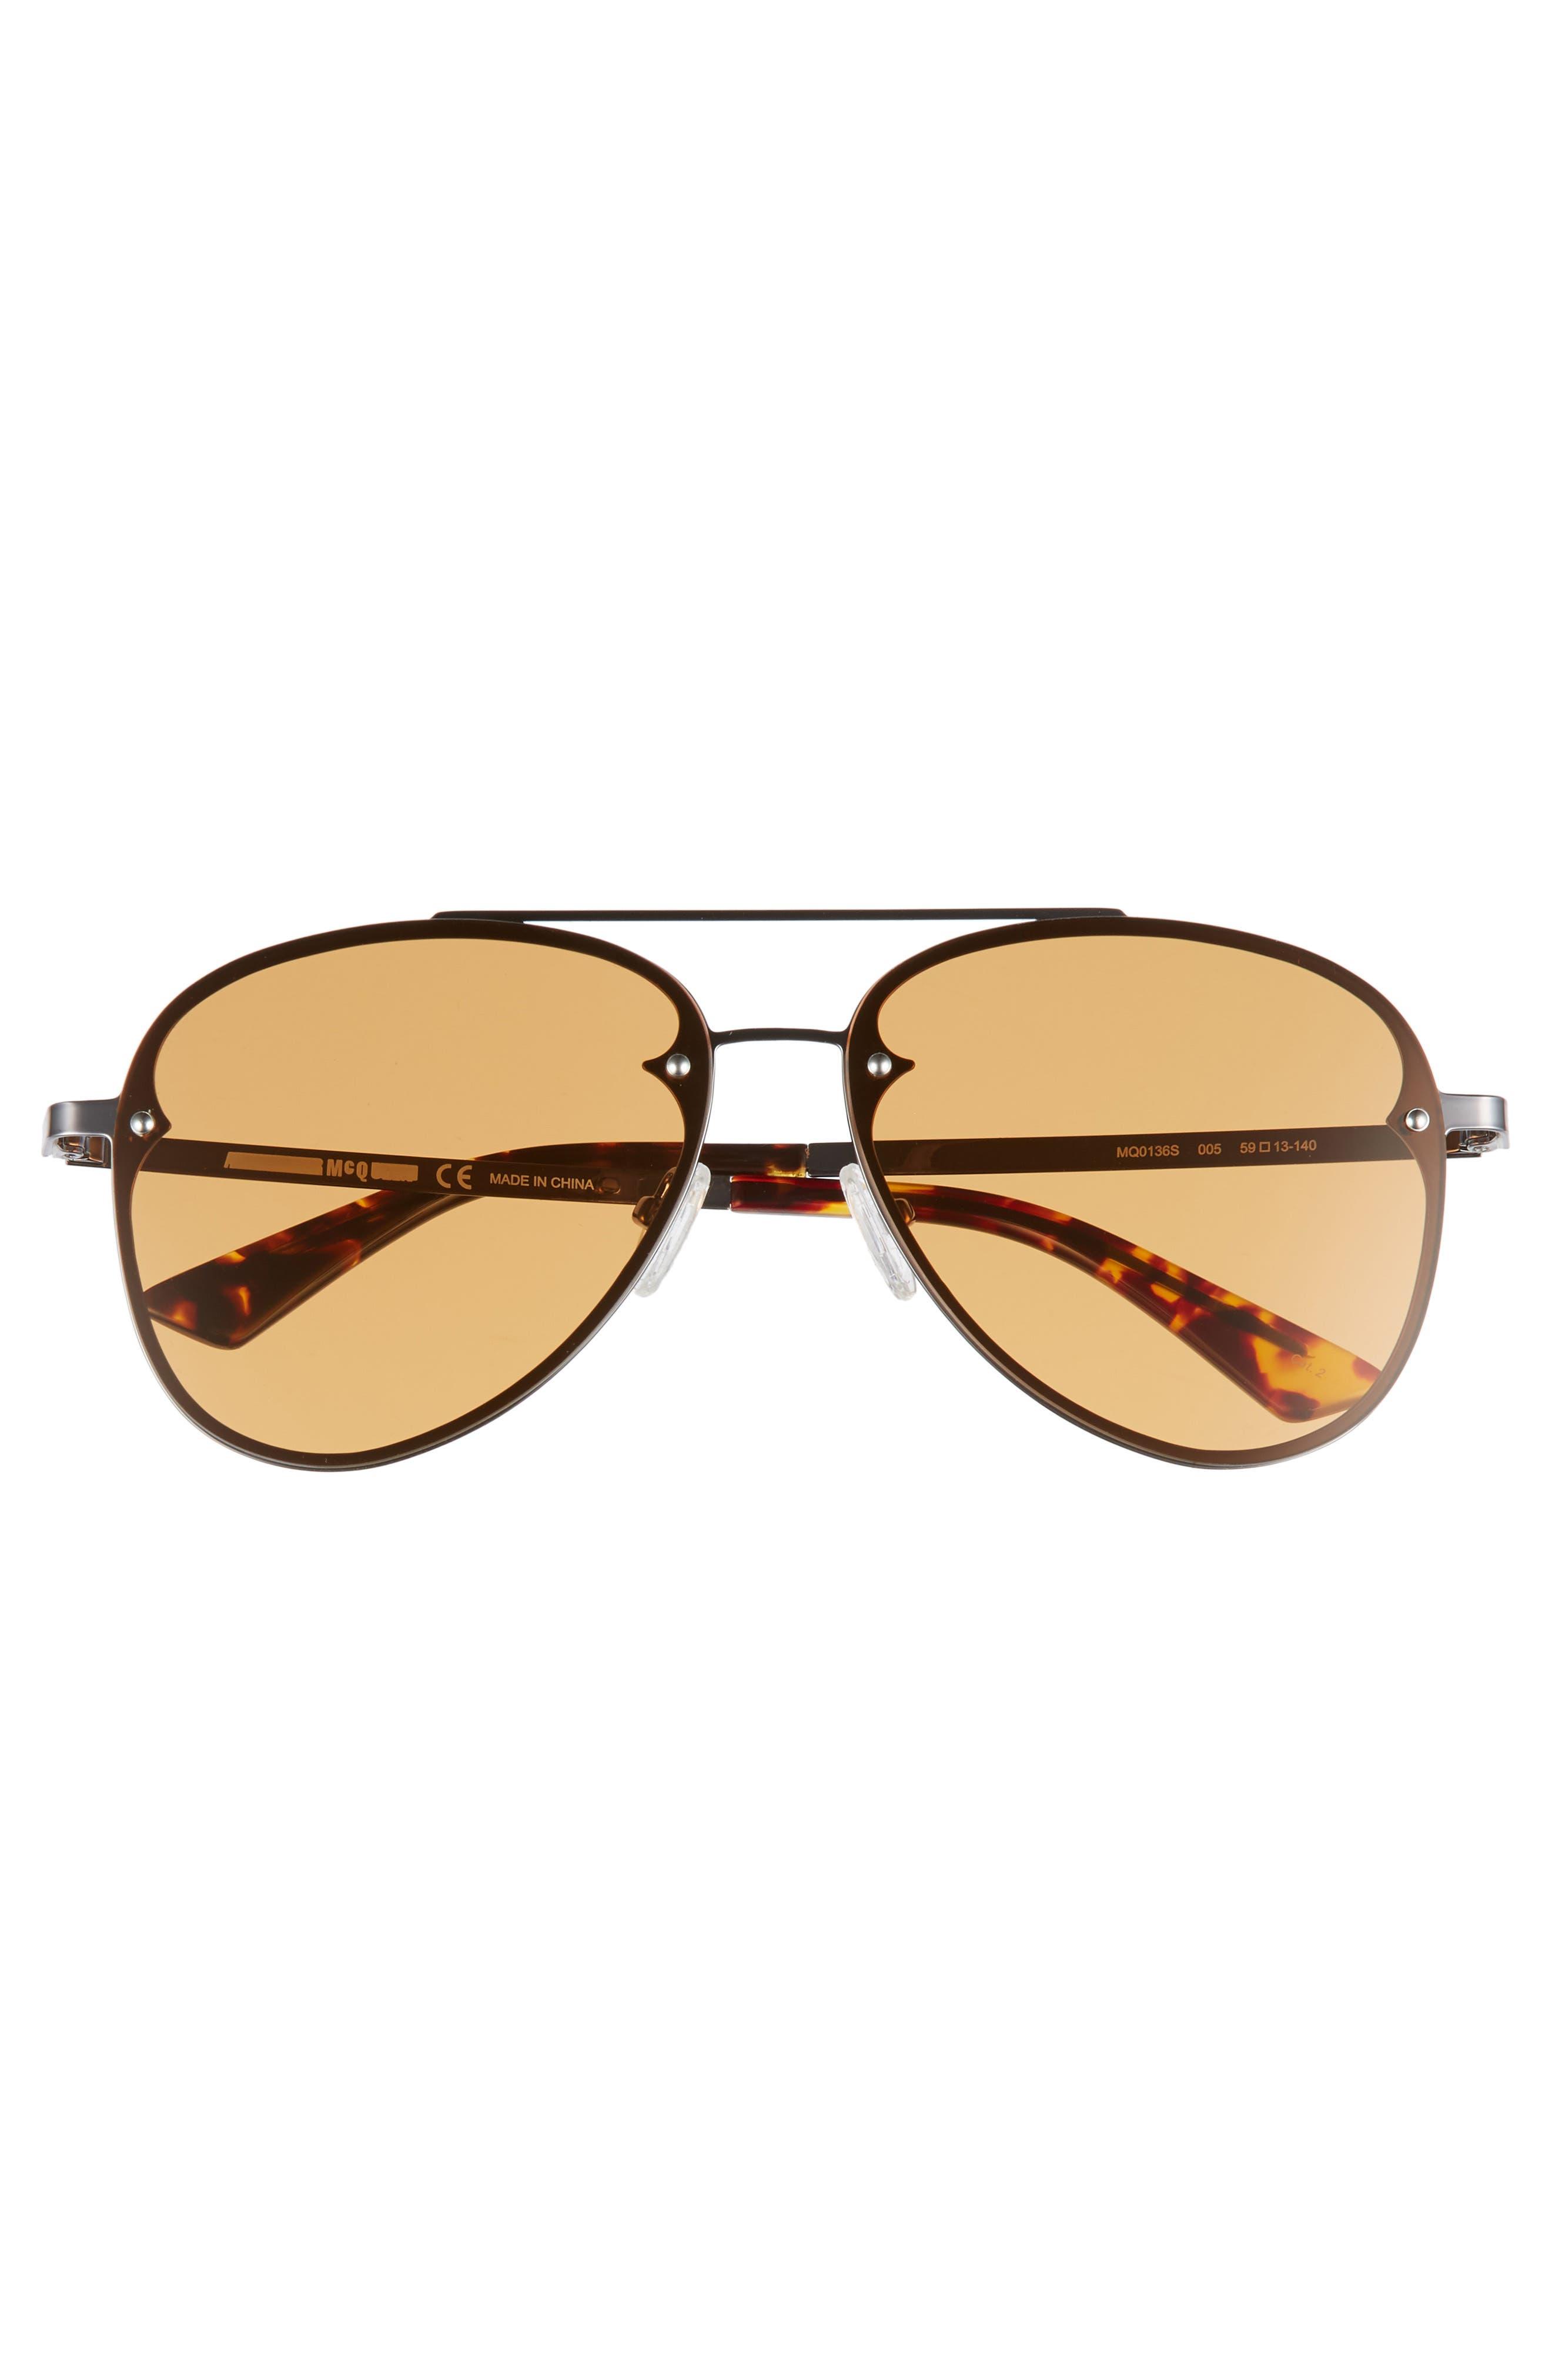 59mm Aviator Sunglasses,                             Alternate thumbnail 3, color,                             RUTHENIUM